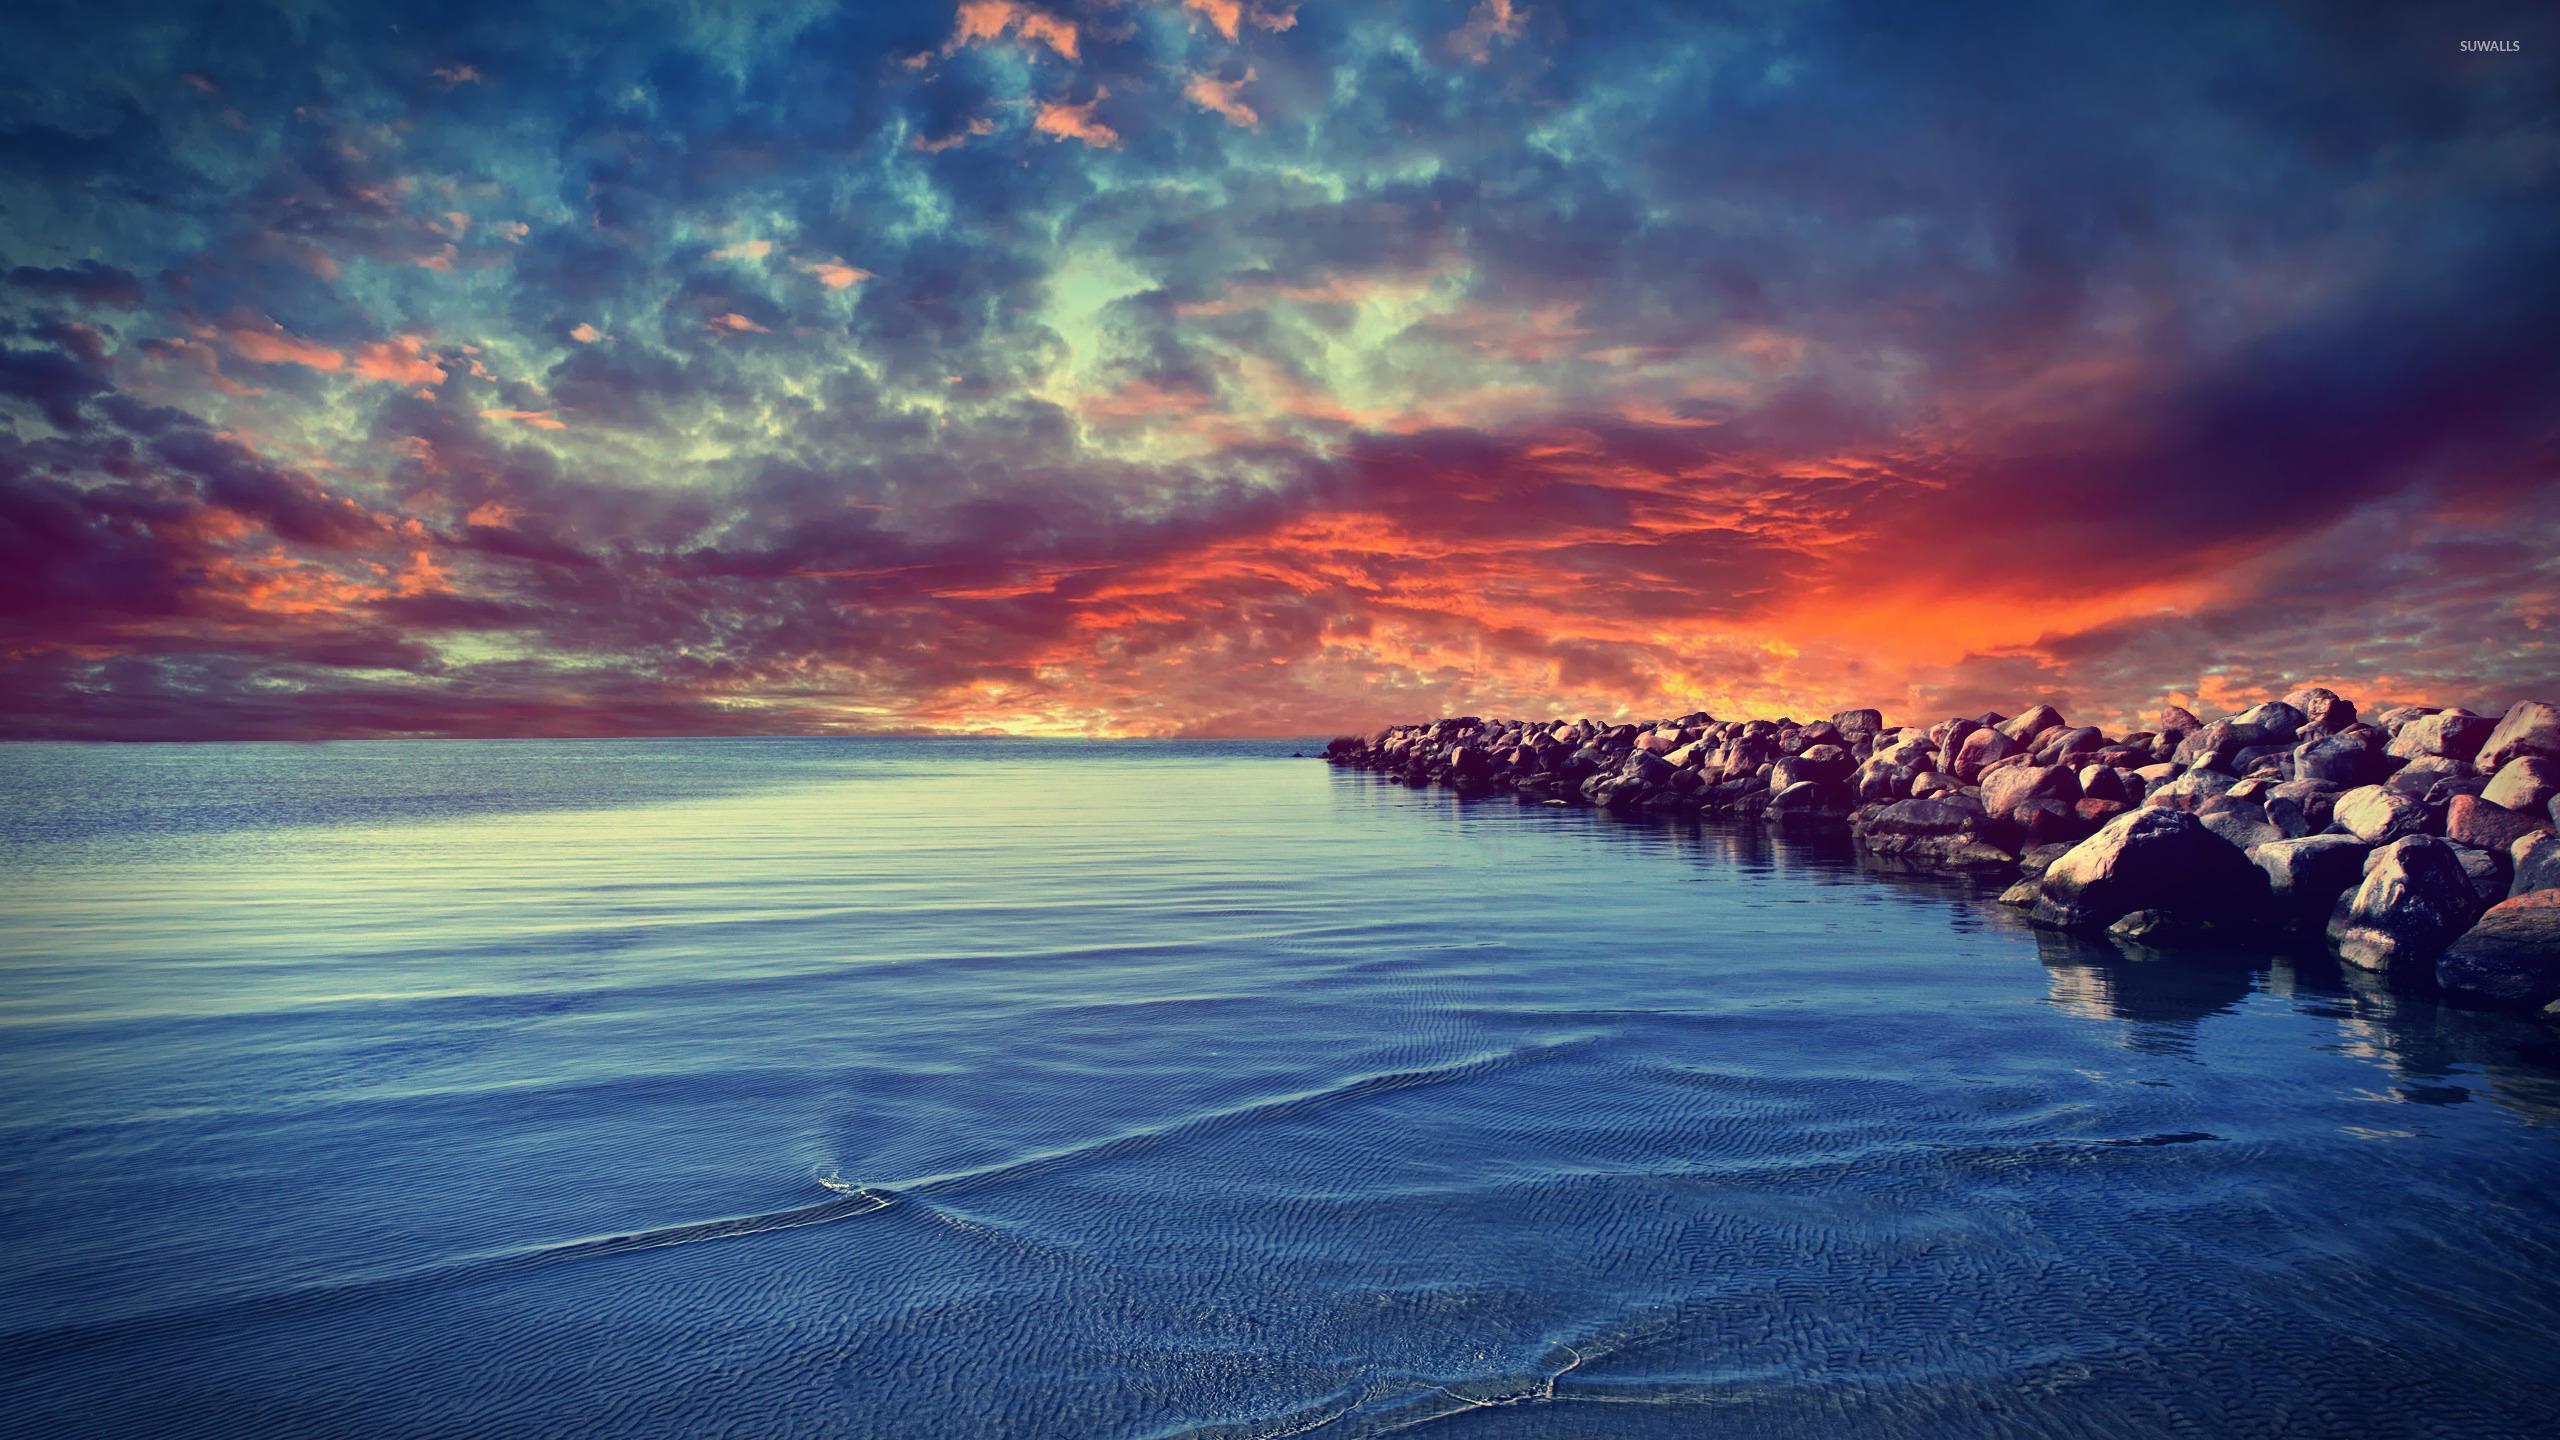 Sunset Over The Rocky Beach Wallpaper